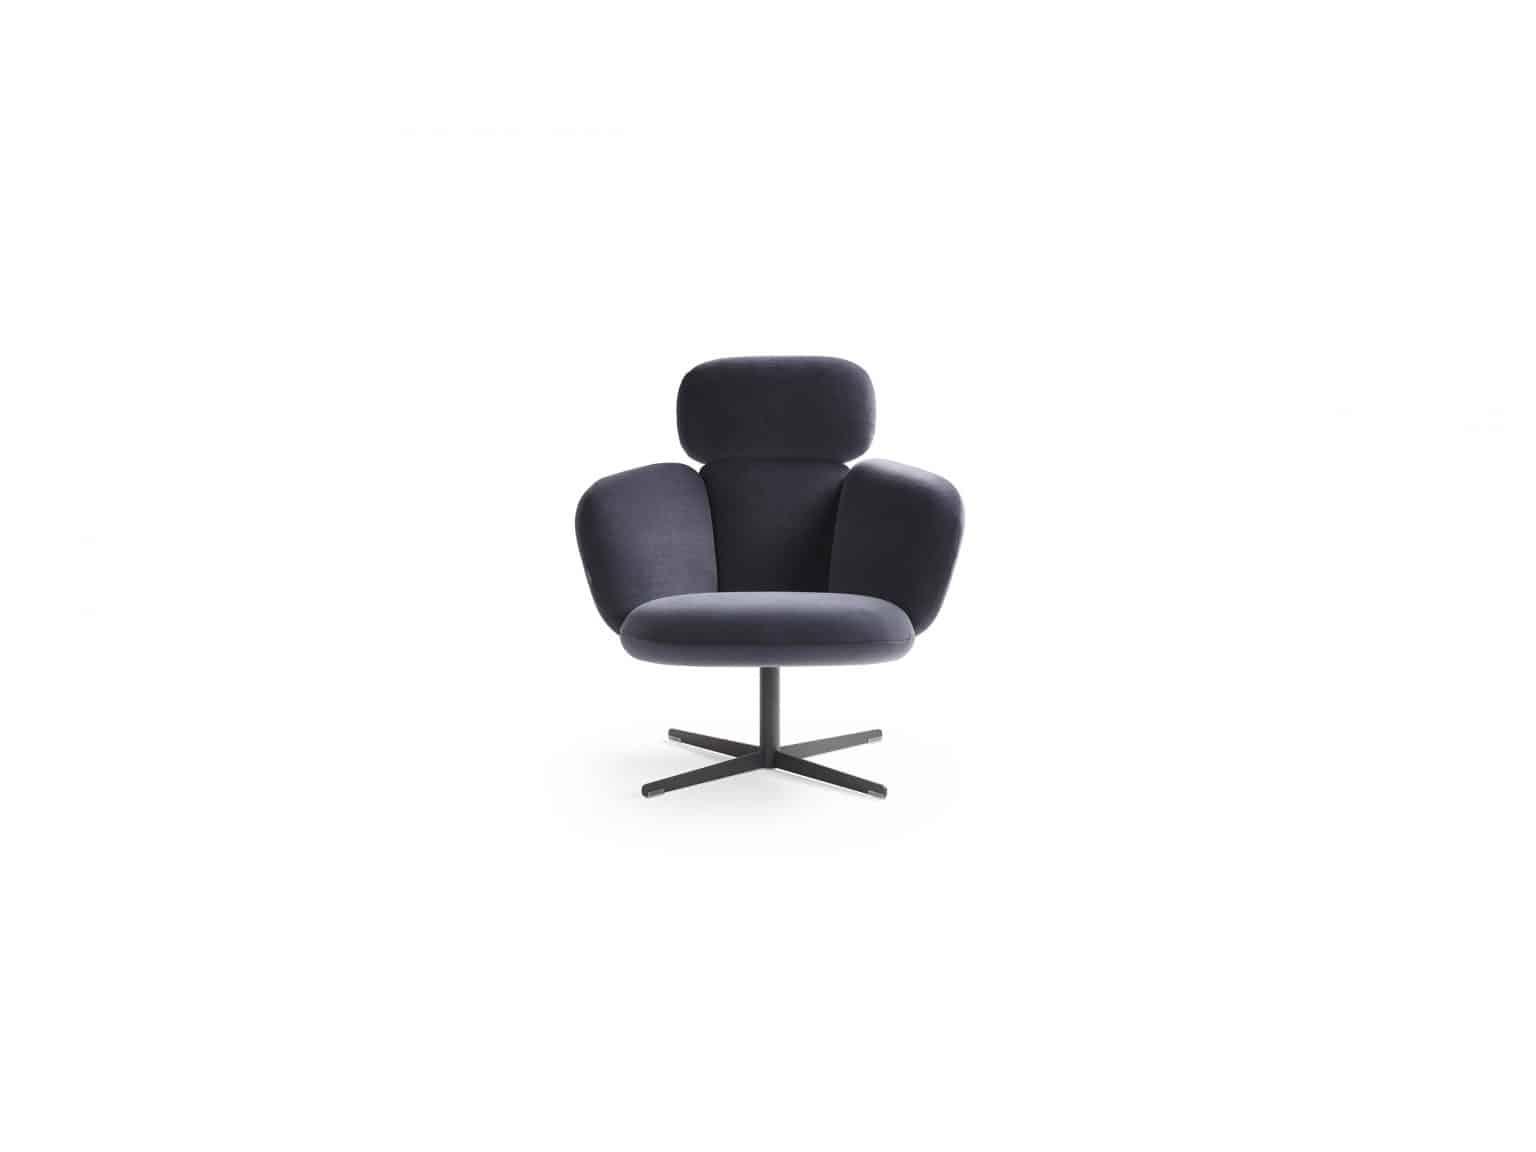 Artifort fauteuil Bras highback pa